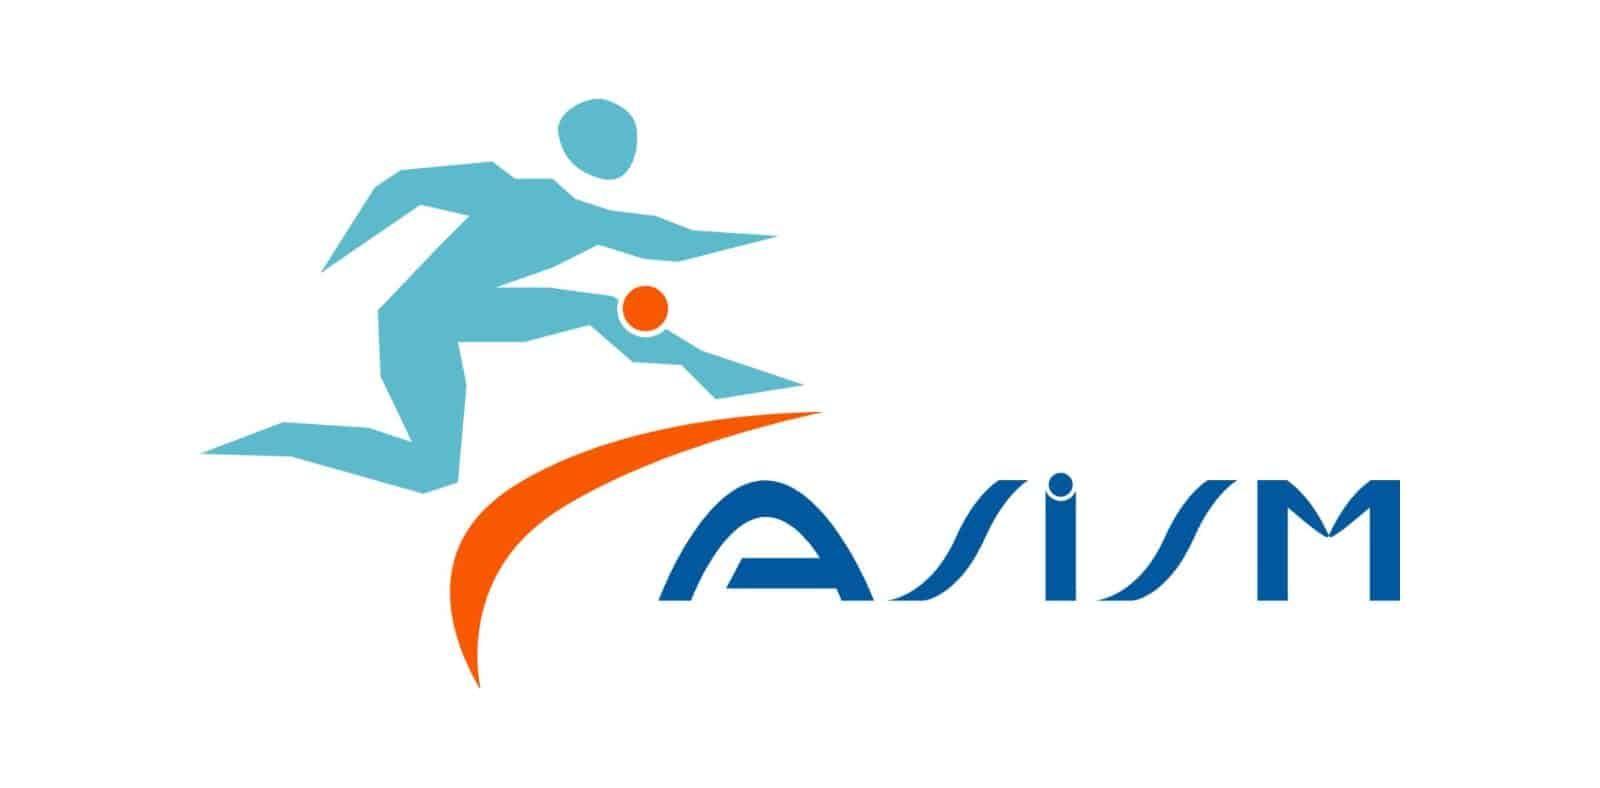 https://arriaza.es/imagenes/asism_logo.jpg